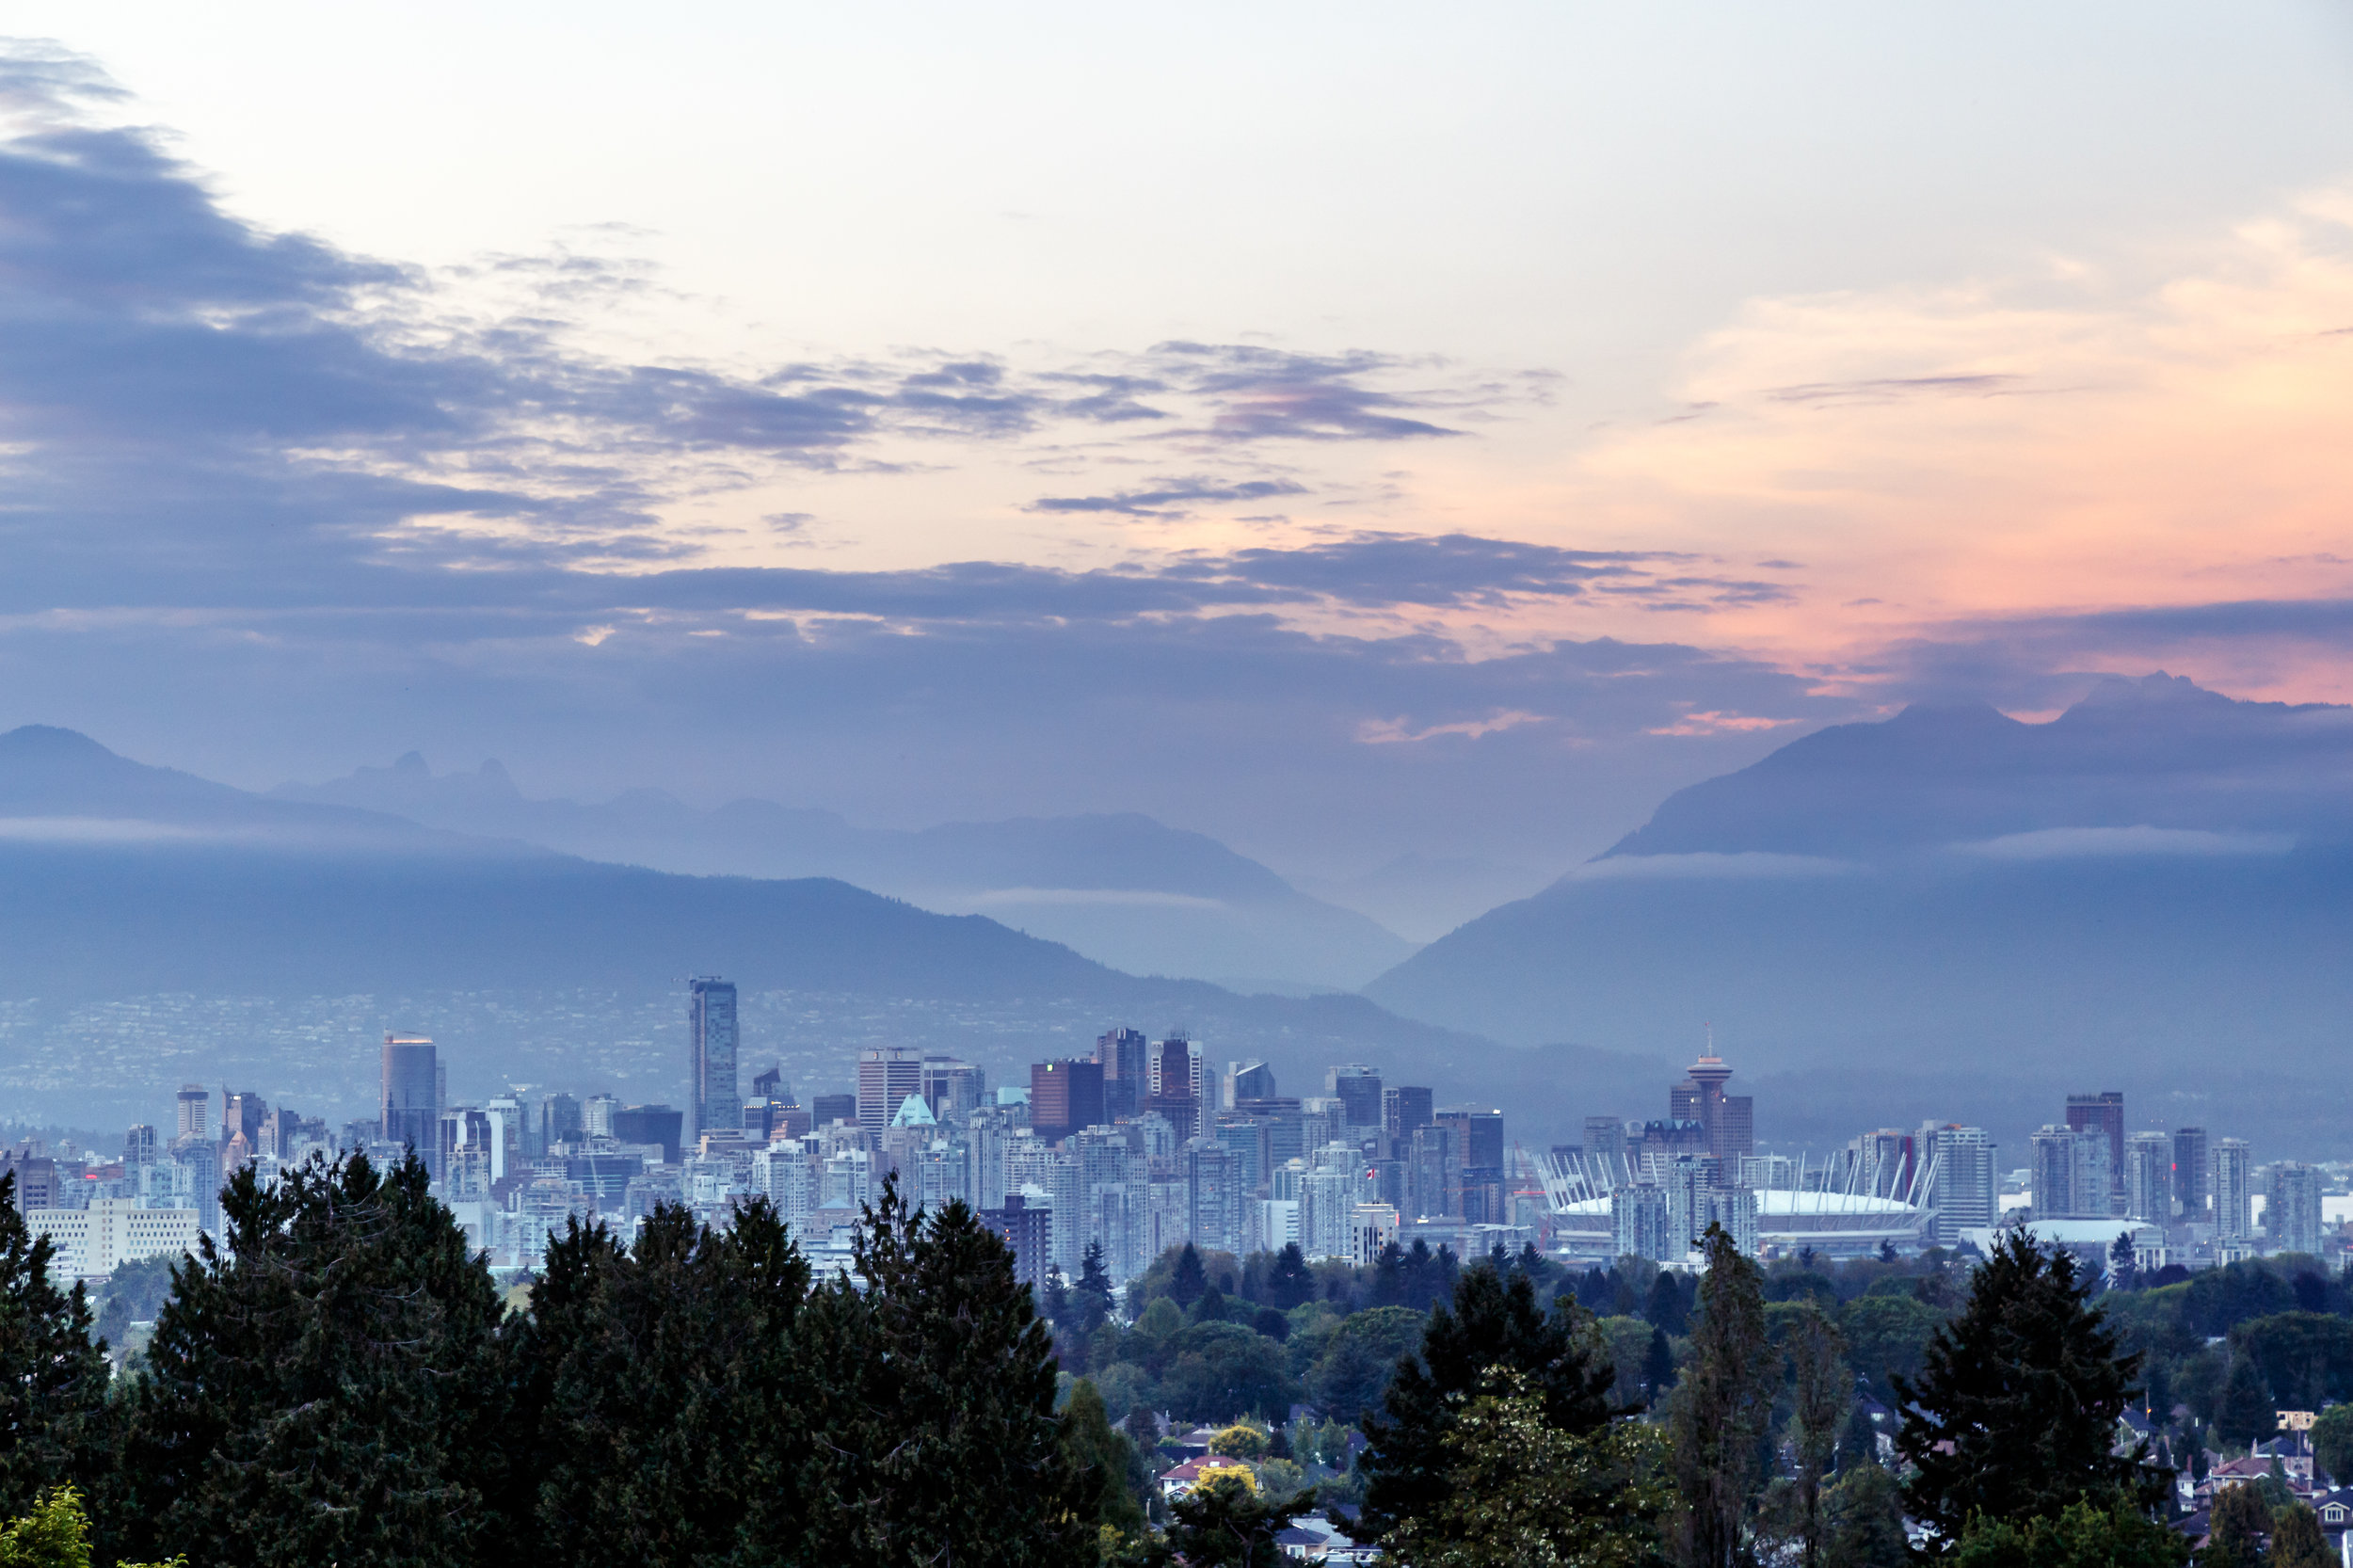 vancouver-skyline-at-dusk-P3DDRFJ.jpg